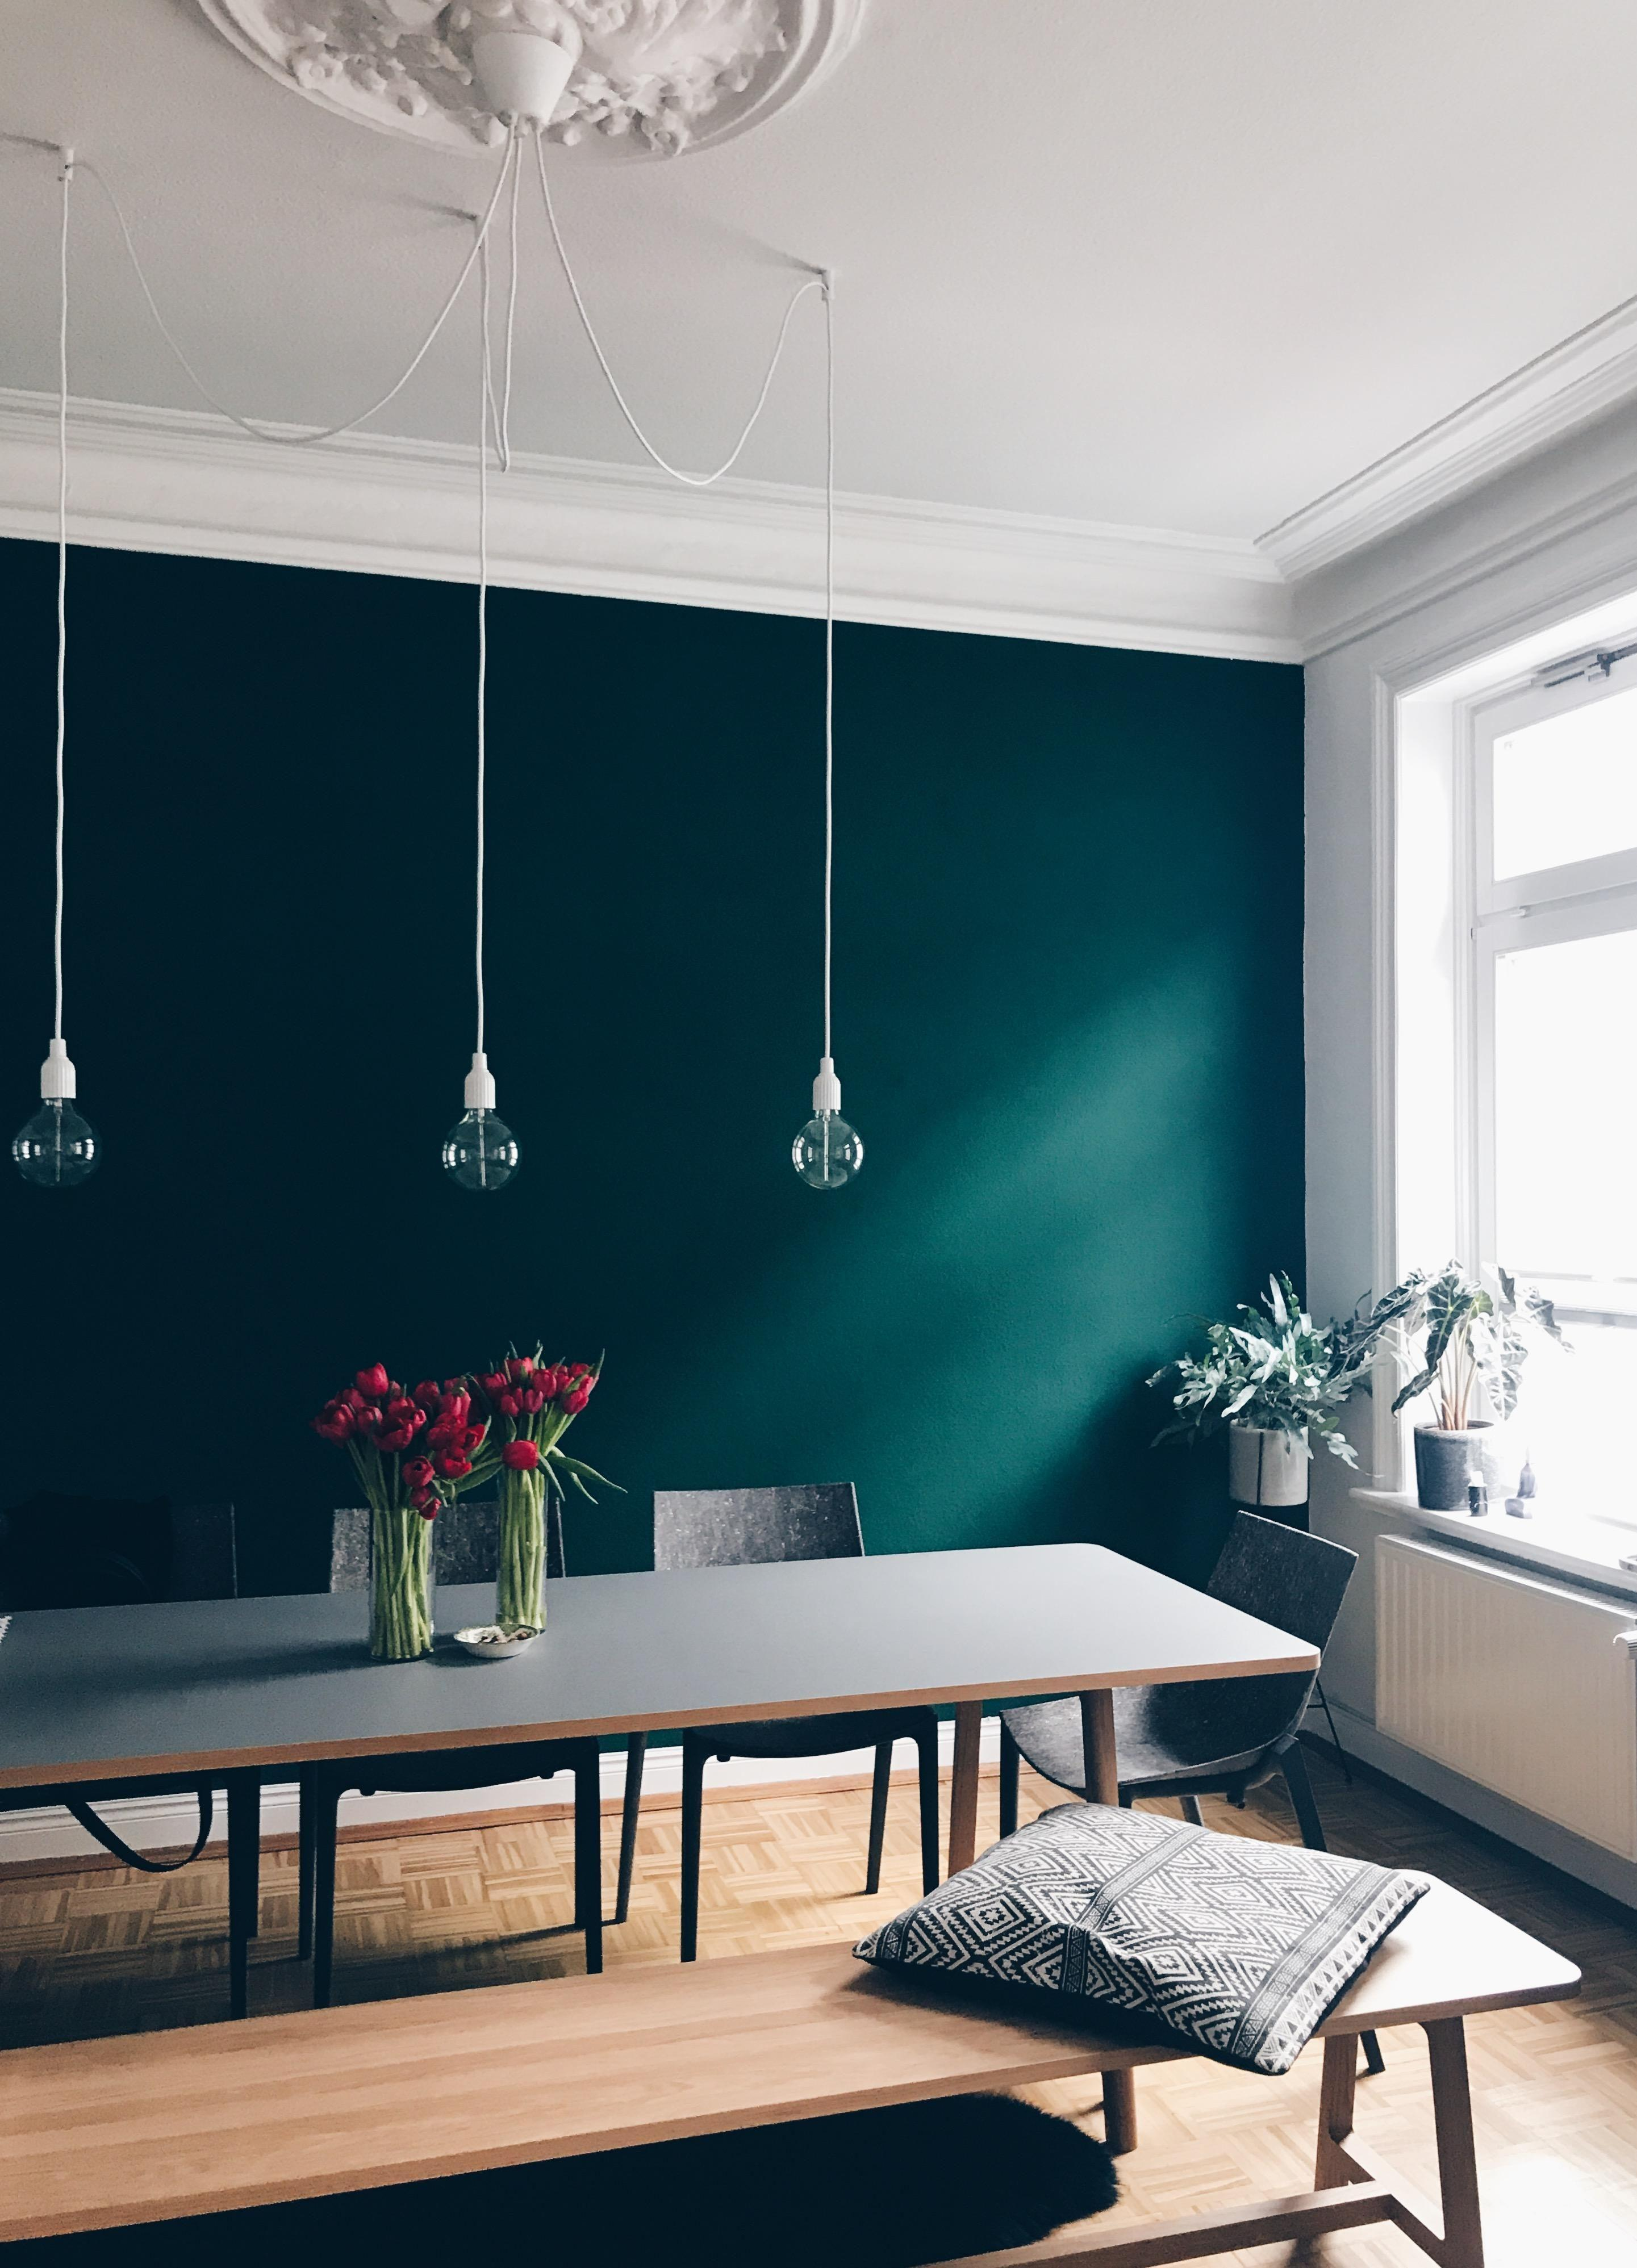 bilder aufh ngen petersburger h ngung wohnzimmer. Black Bedroom Furniture Sets. Home Design Ideas